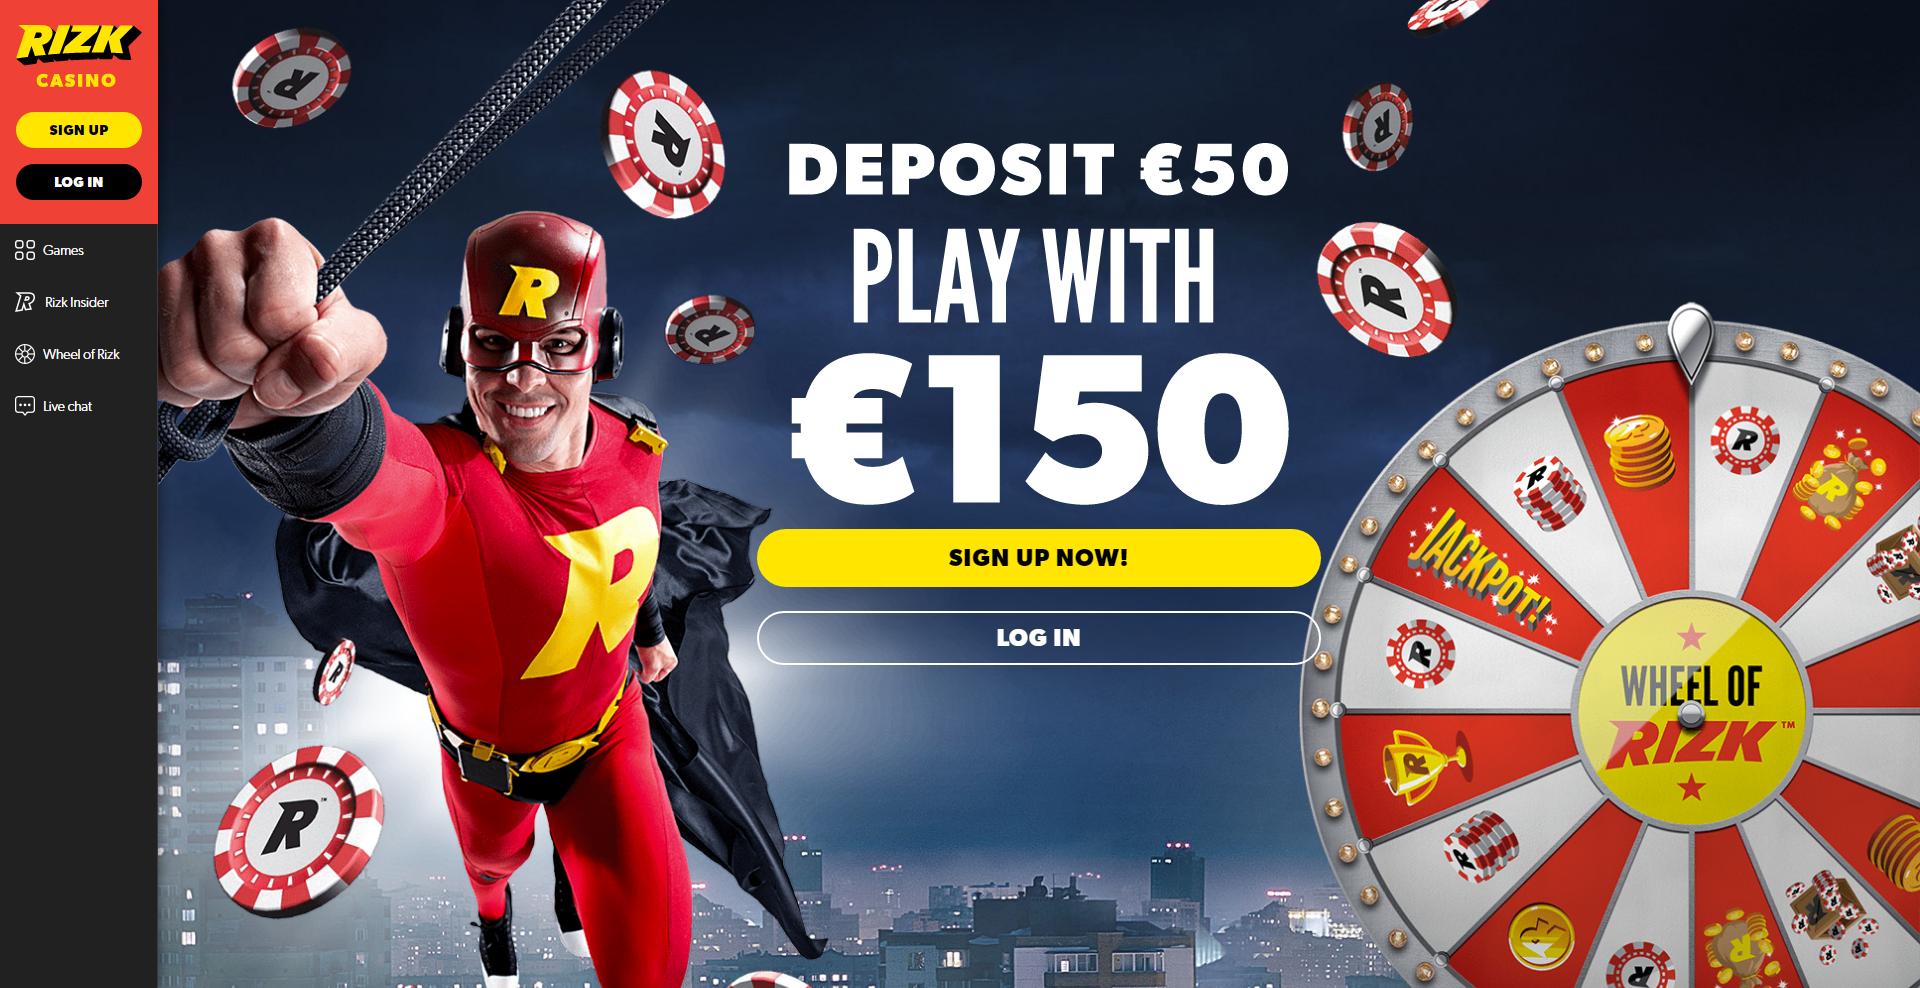 Rizk Casino, 200 deposit bonus!! Super fast payouts of